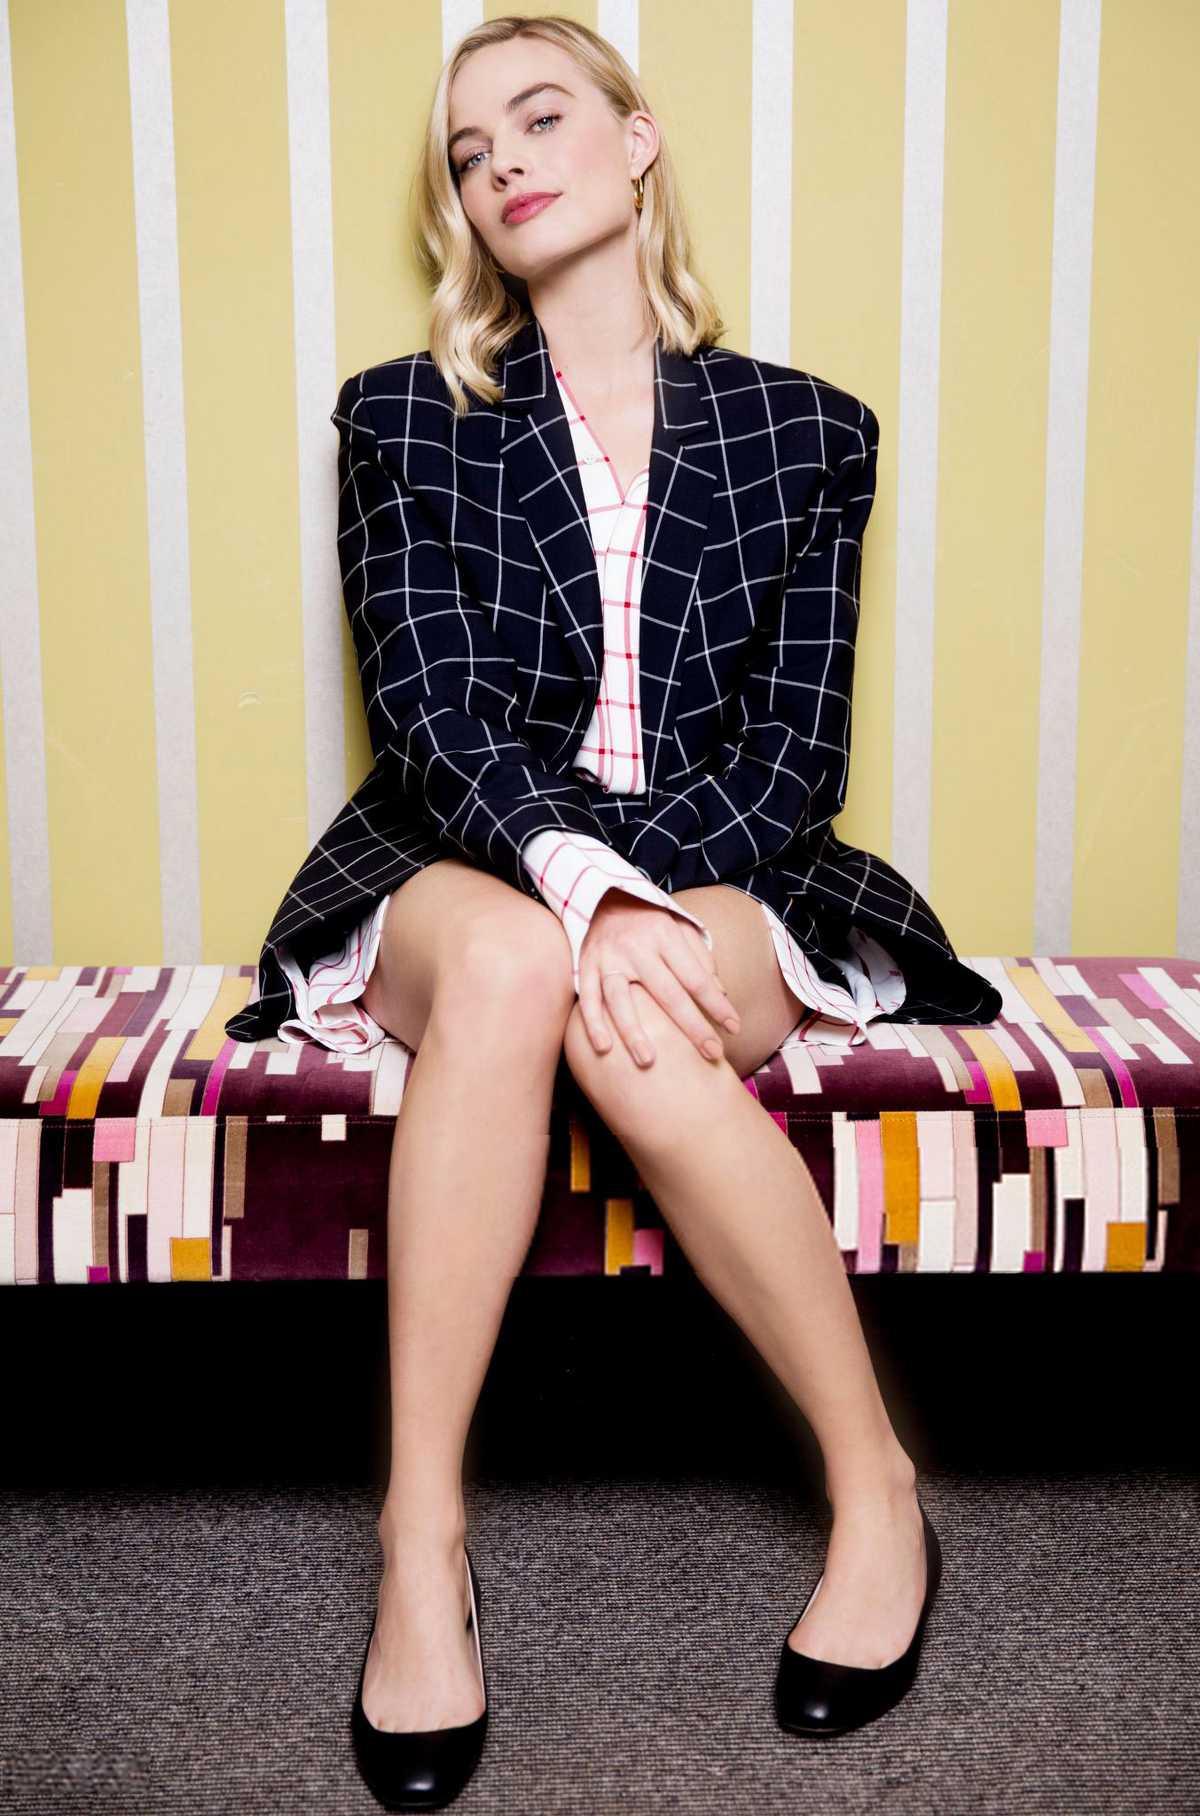 Margot Robbie images Margot Robbie   Sports Illustrated Photoshoot 1200x1816